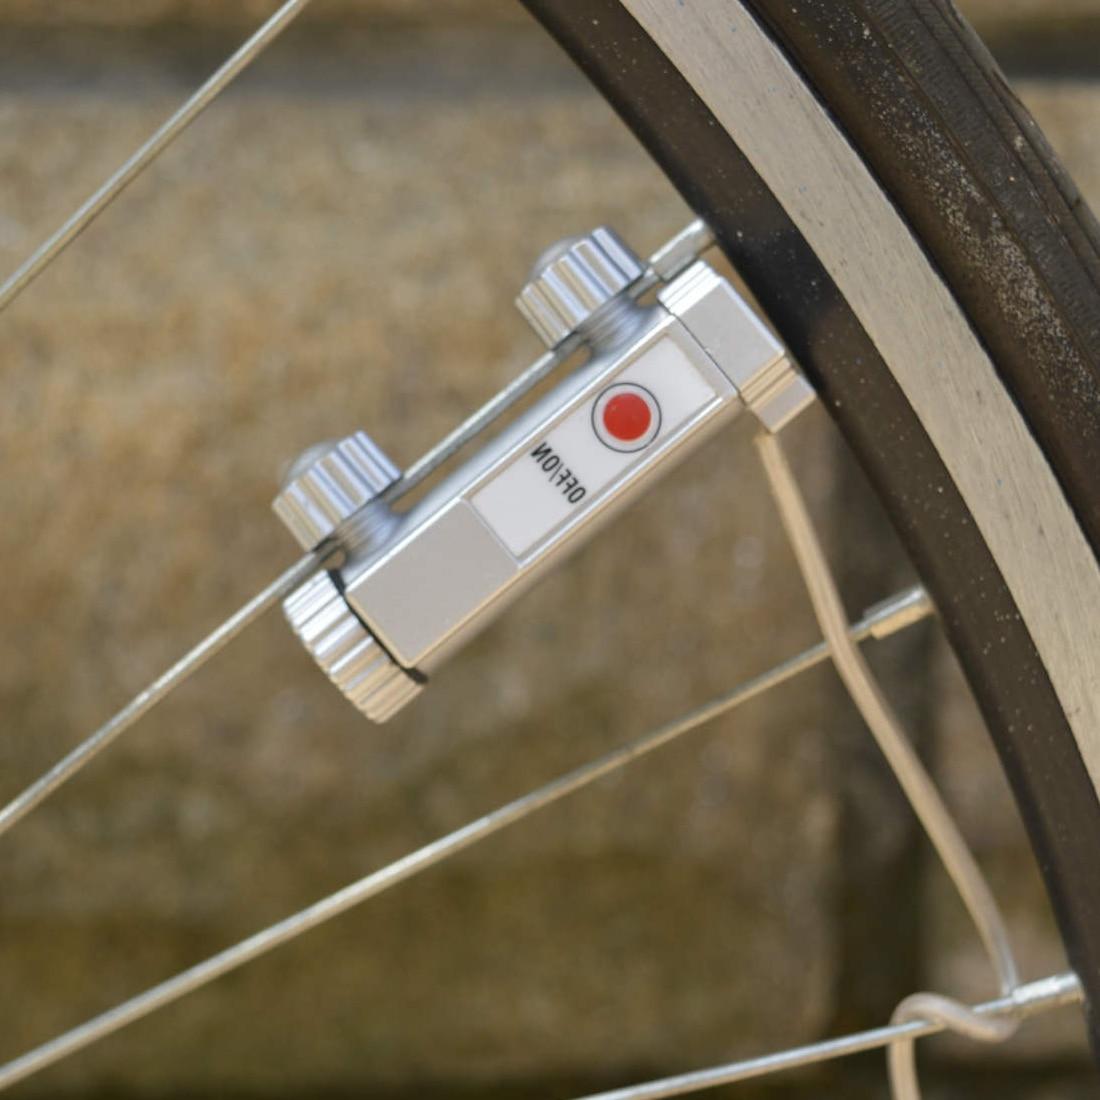 09f6f4197 Ciclismo 20 Luci LED Bicicletta Mountain Bike Luce ha parlato ruota Lampada  Outdoor Sports bicycl